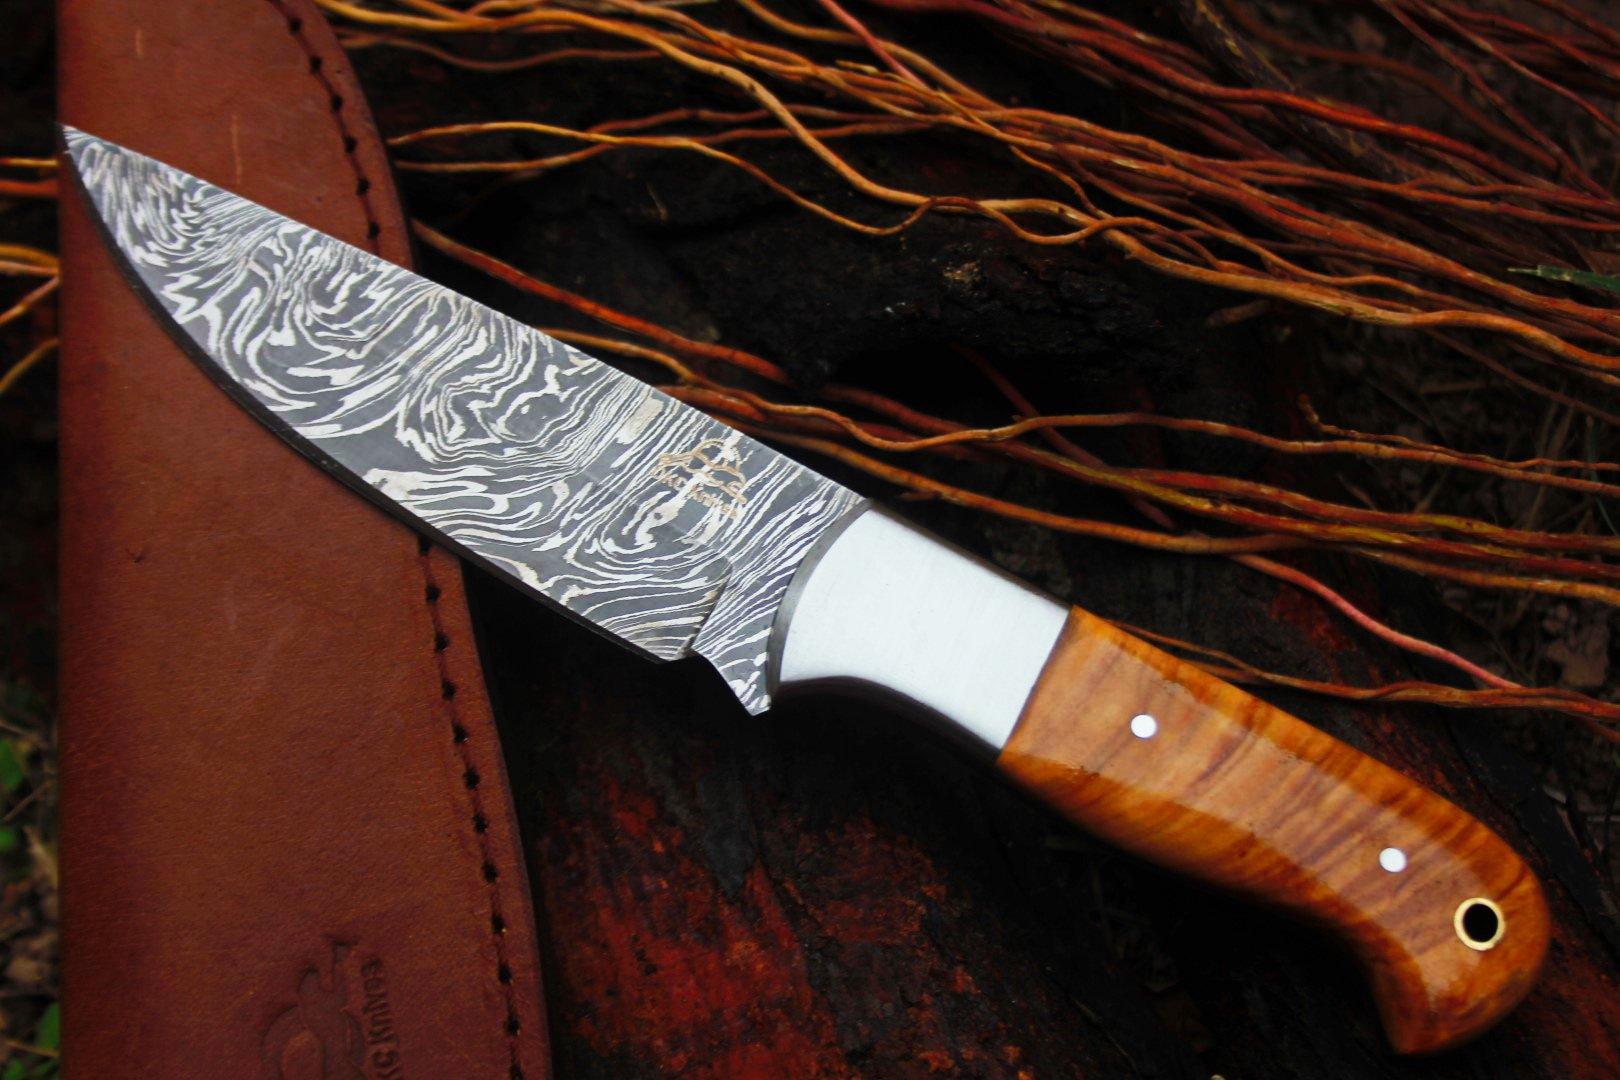 DKC Knives (20 5/18) SALE DKC-511 TRAIL BLAZER Fixed Blade Damascus Steel Hunting Knife Olive Wood Burl Handle 9'' Long, 5.5'' Blade 8oz Work of Art !